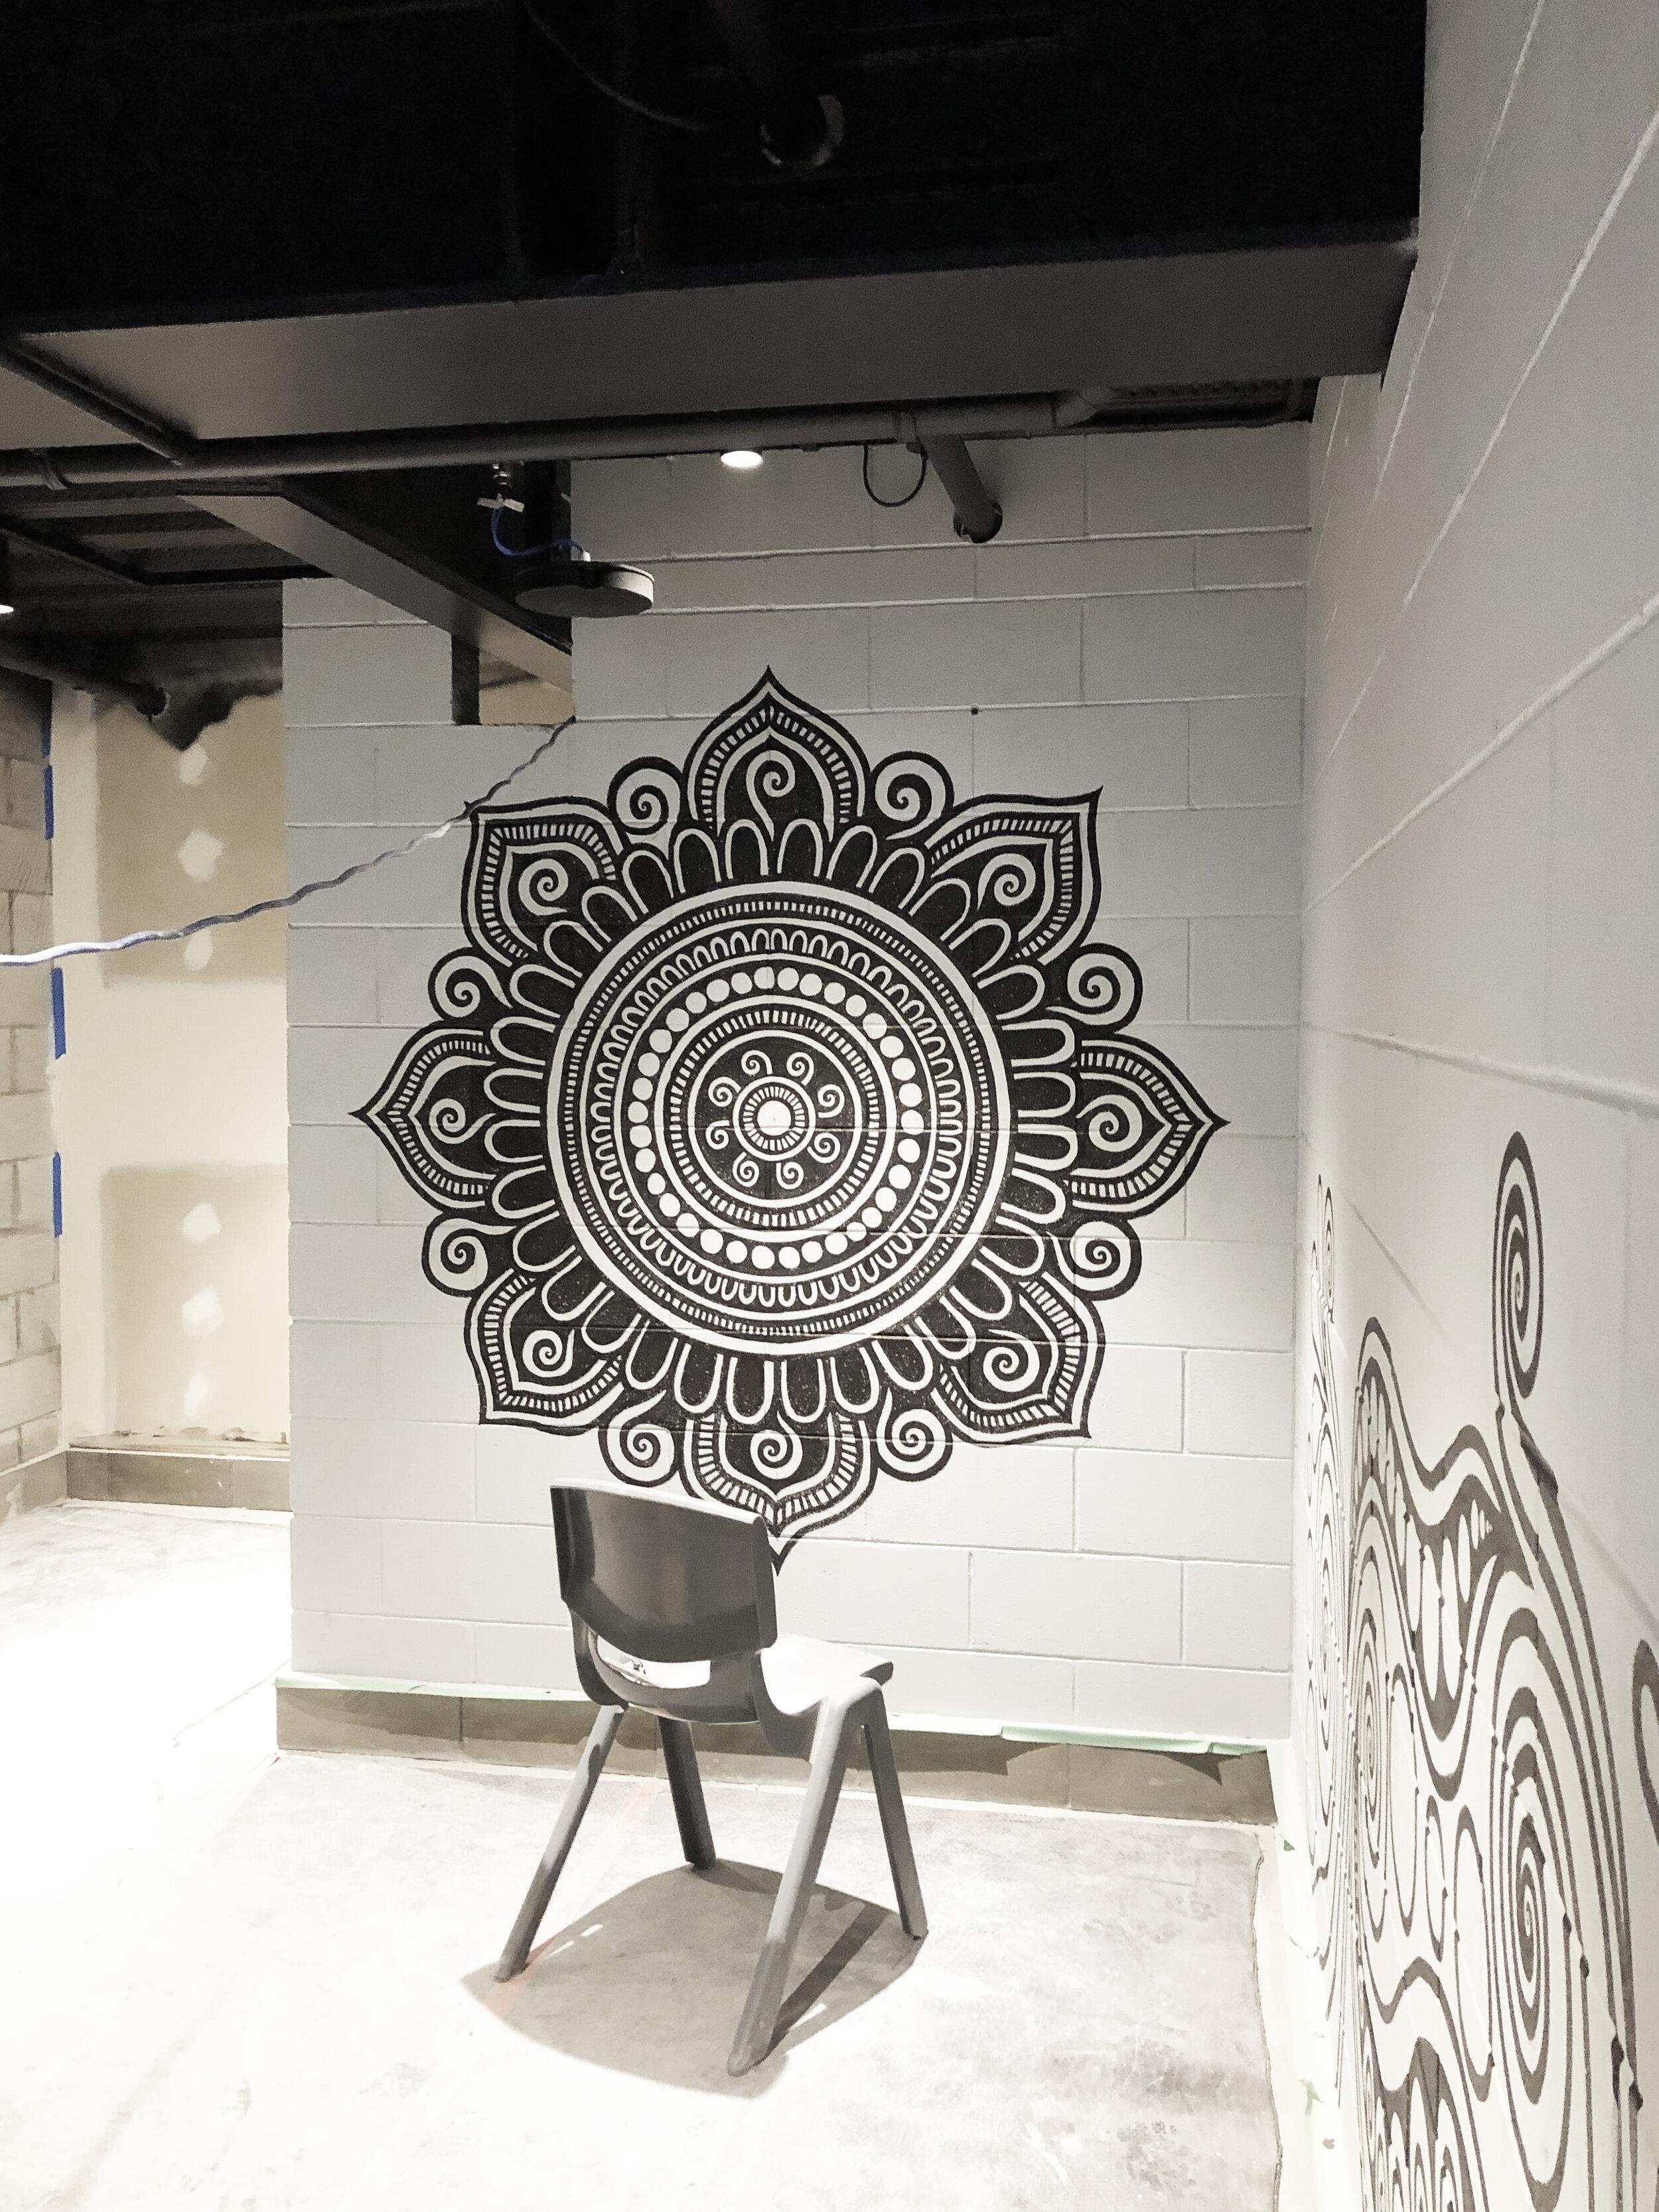 fortyonehundred-wall-mural-artist2.jpg